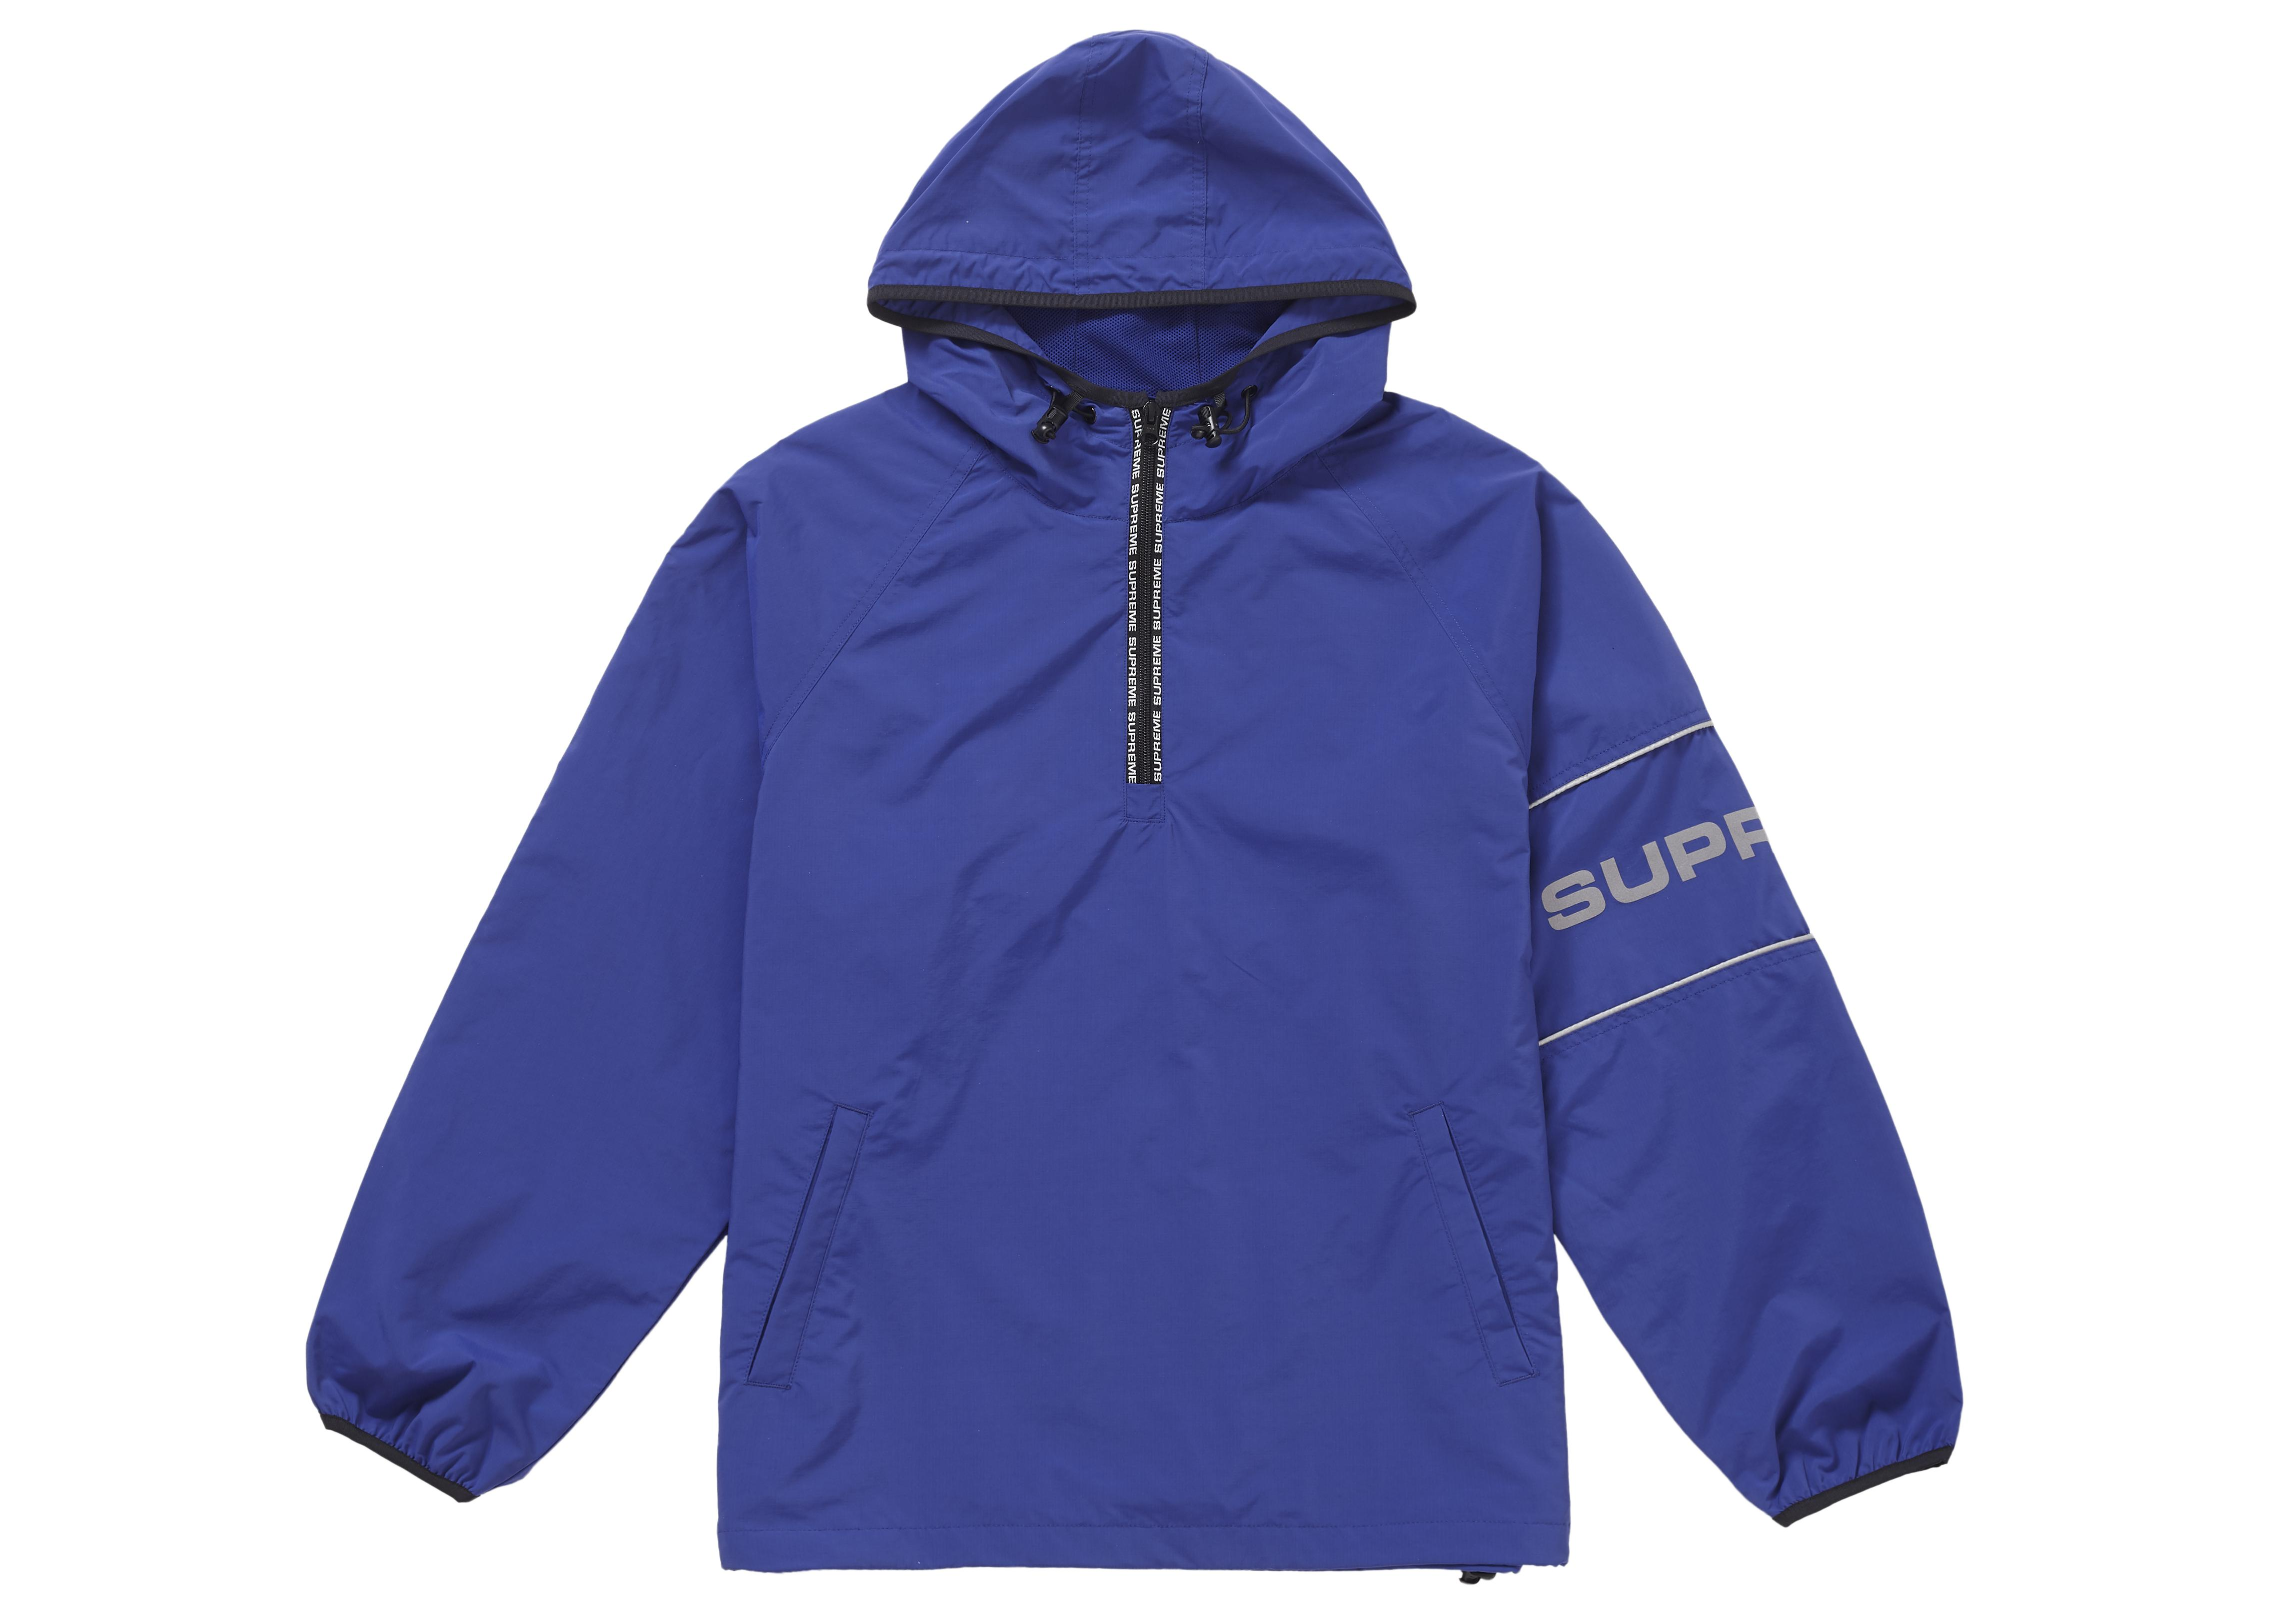 5bef6630 Supreme Blue Nylon Ripstop Hooded Pullover Royal for men. View fullscreen